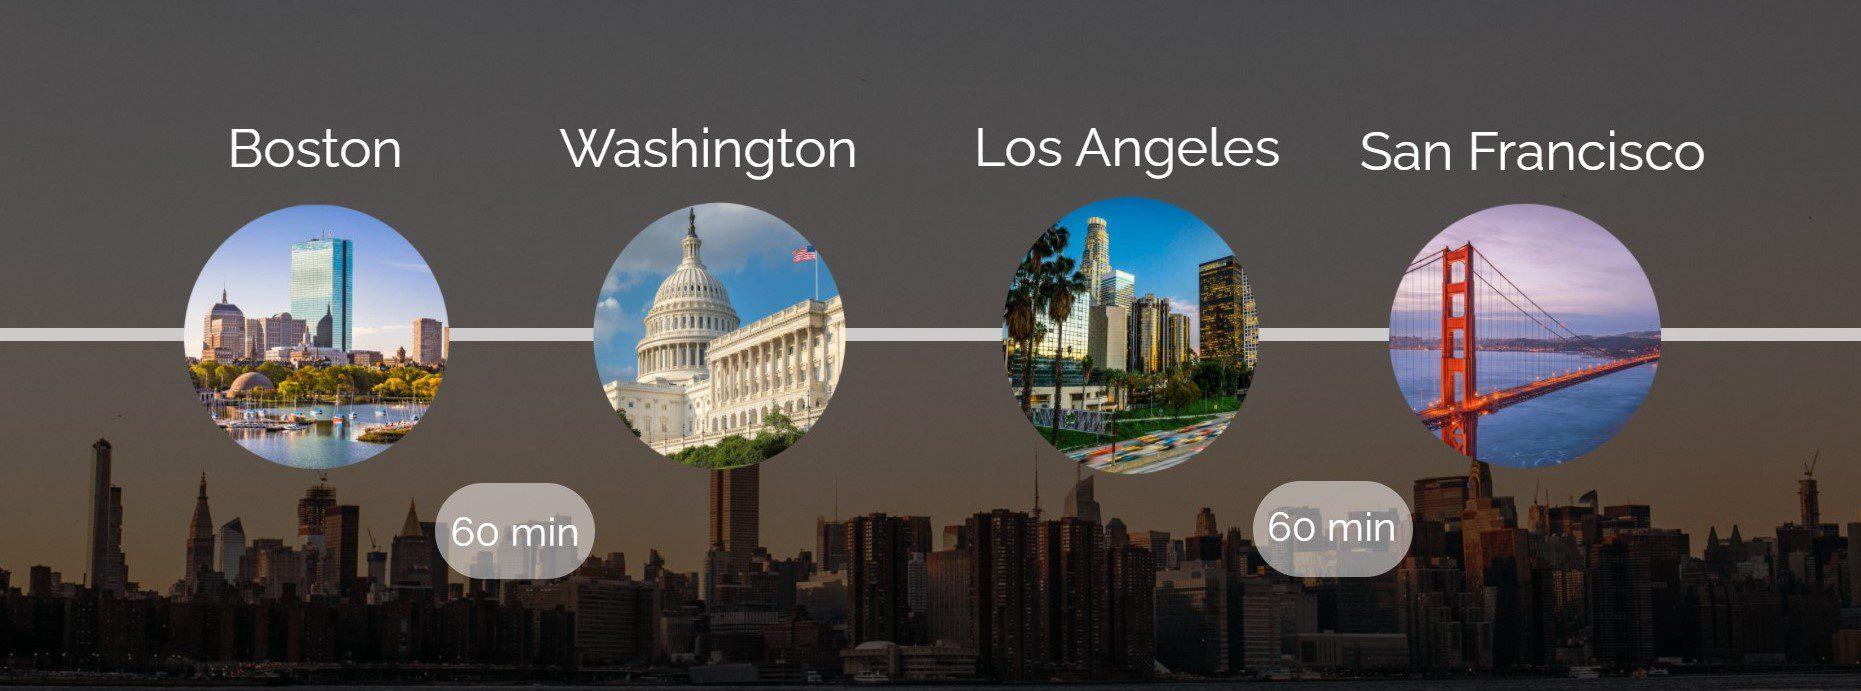 North America Routes 2050